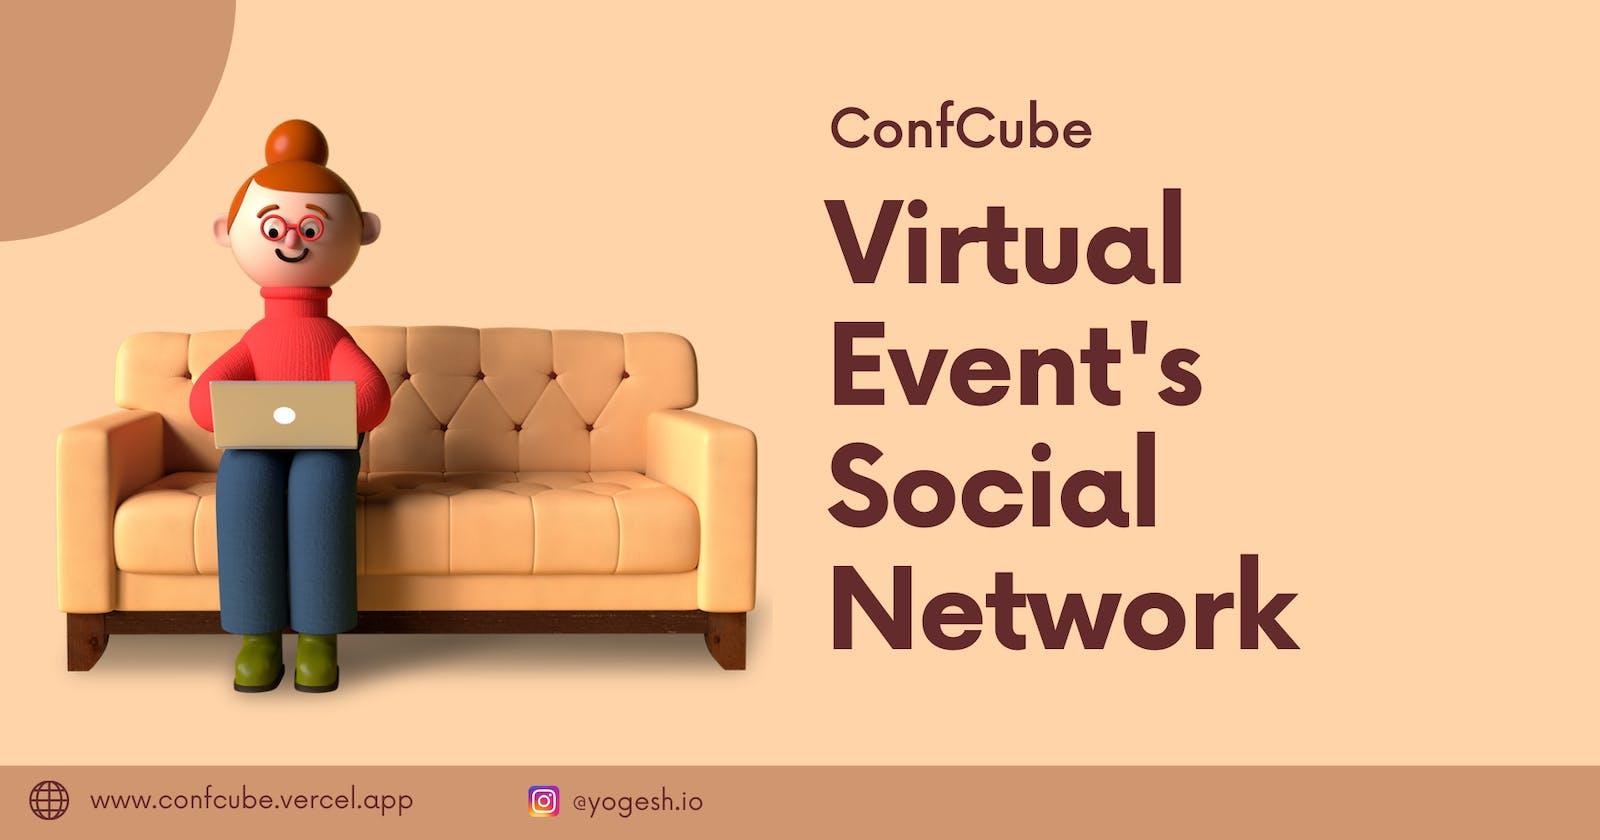 ConfCube - Virtual Tech Event's Social Network 🔥